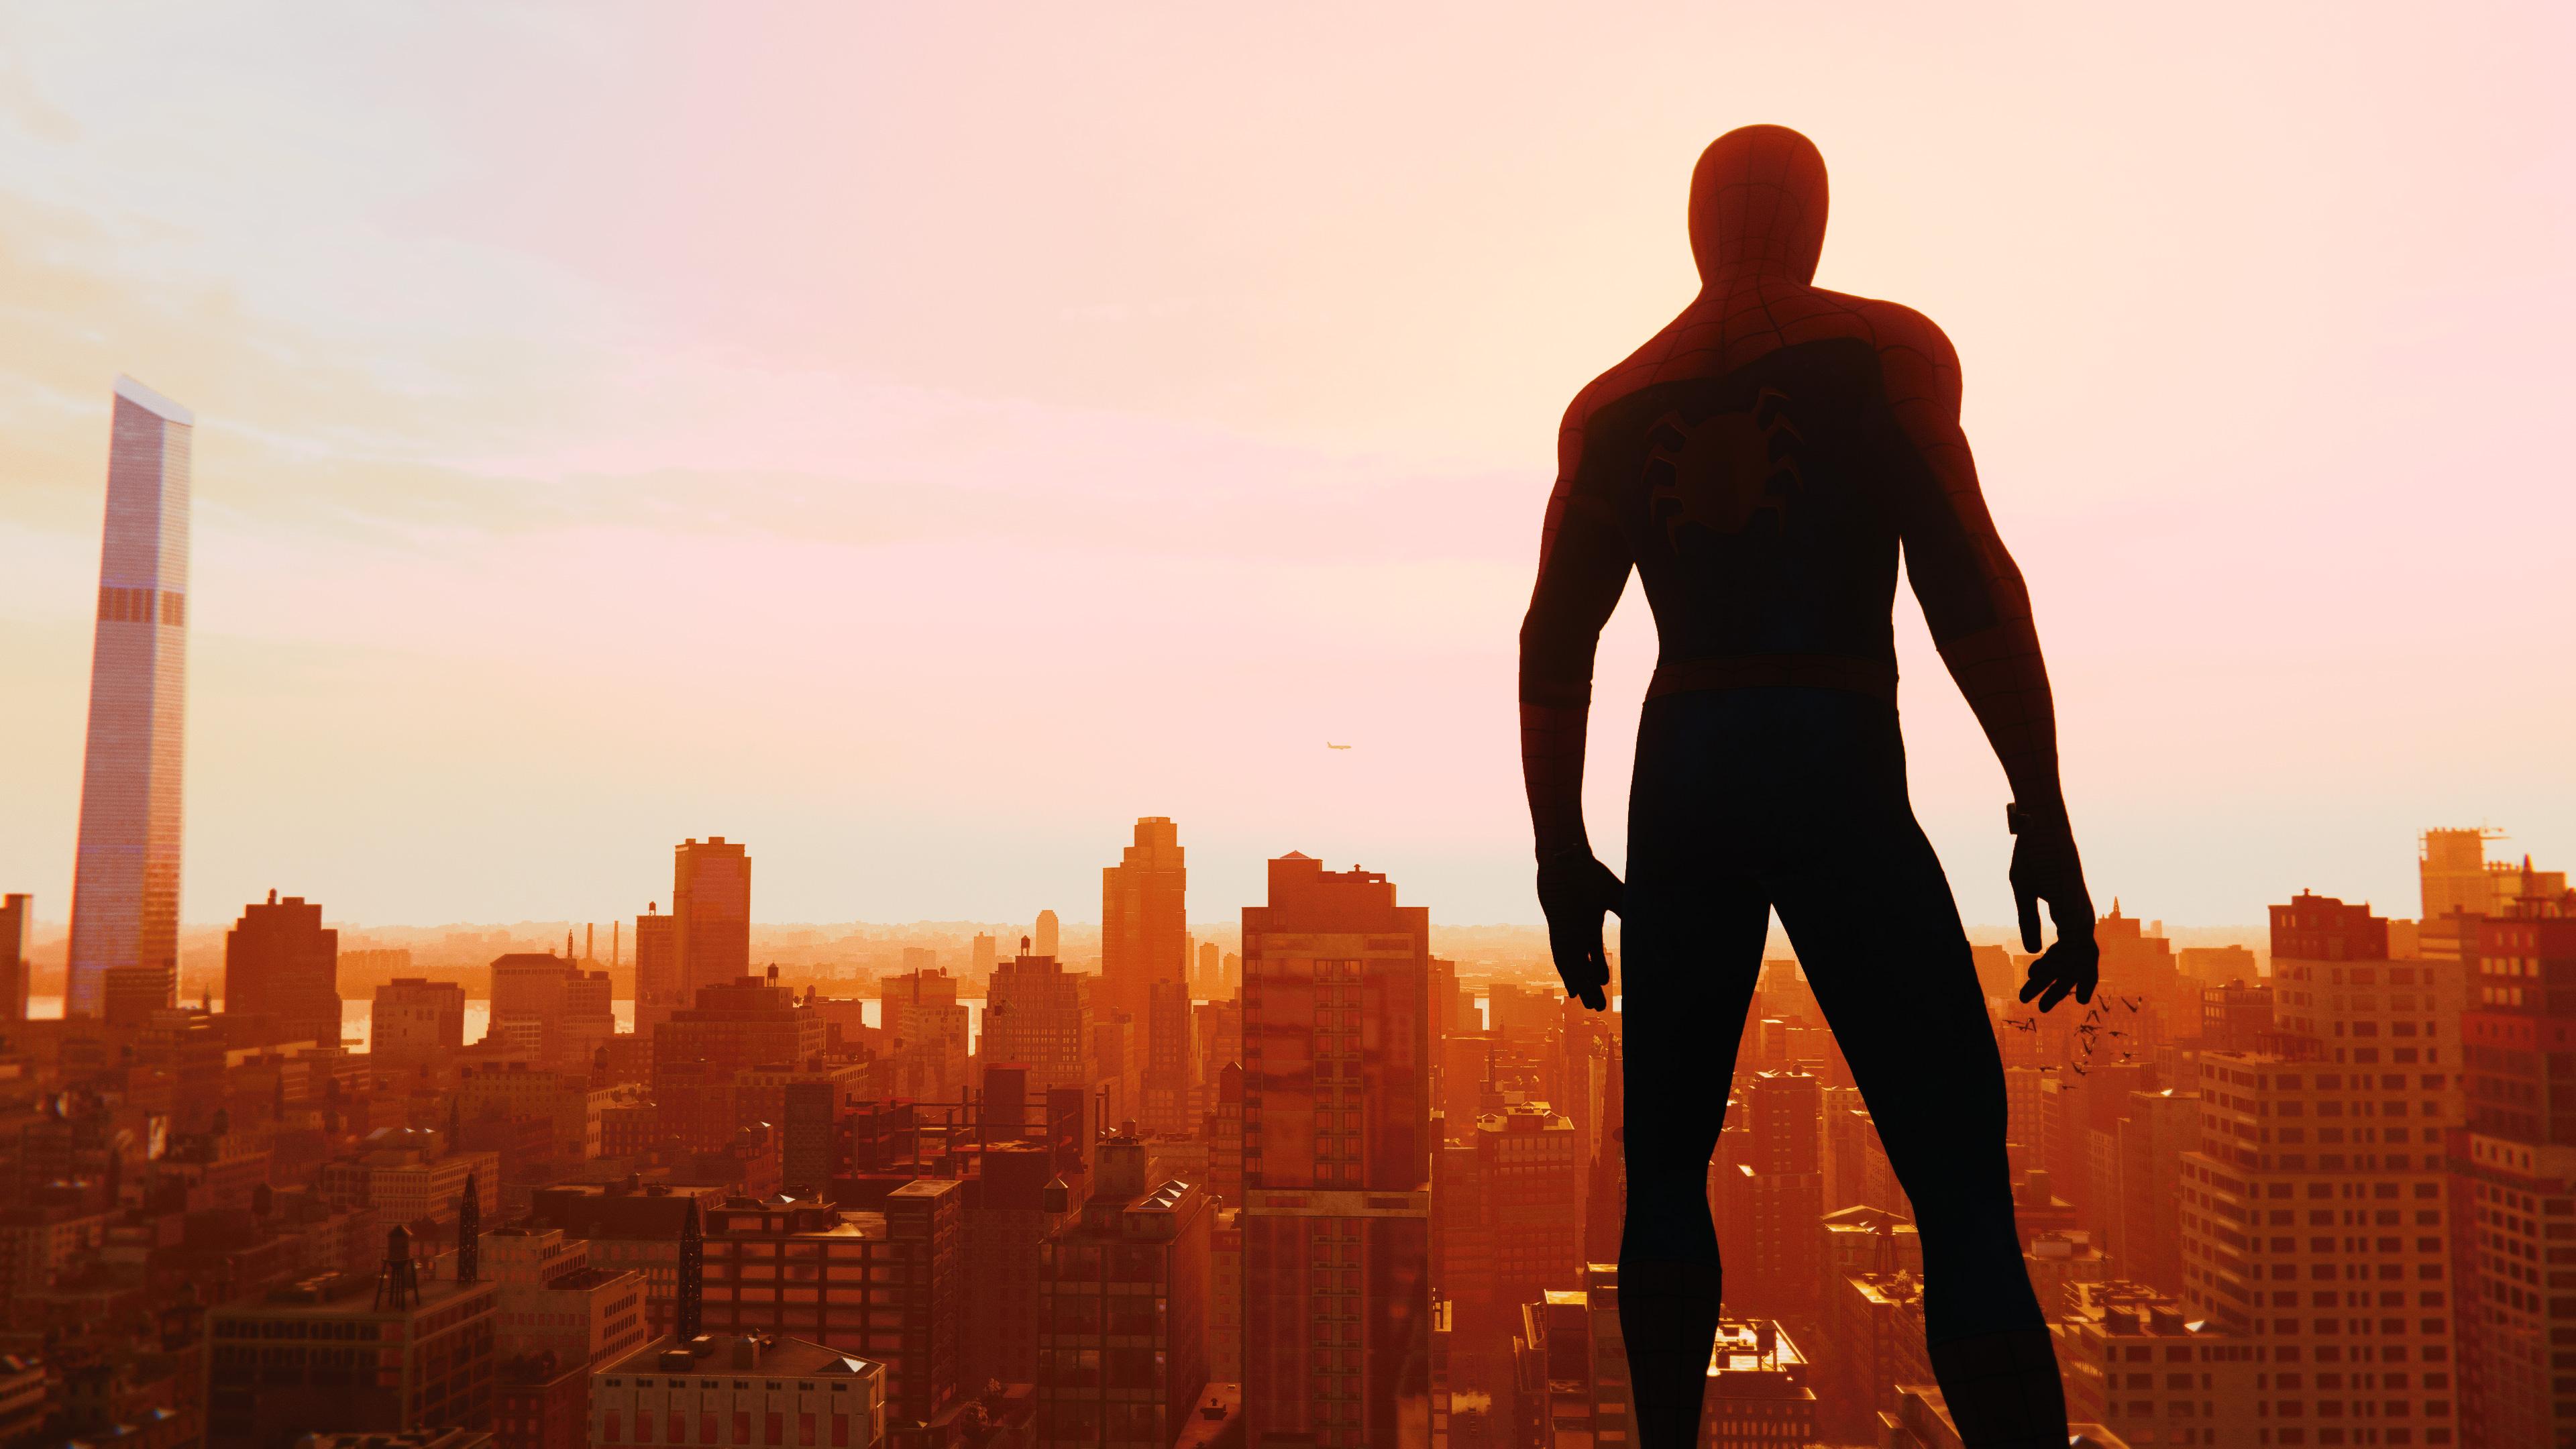 Spiderman Ps4 Skyline 4k Hd Games 4k Wallpapers Images